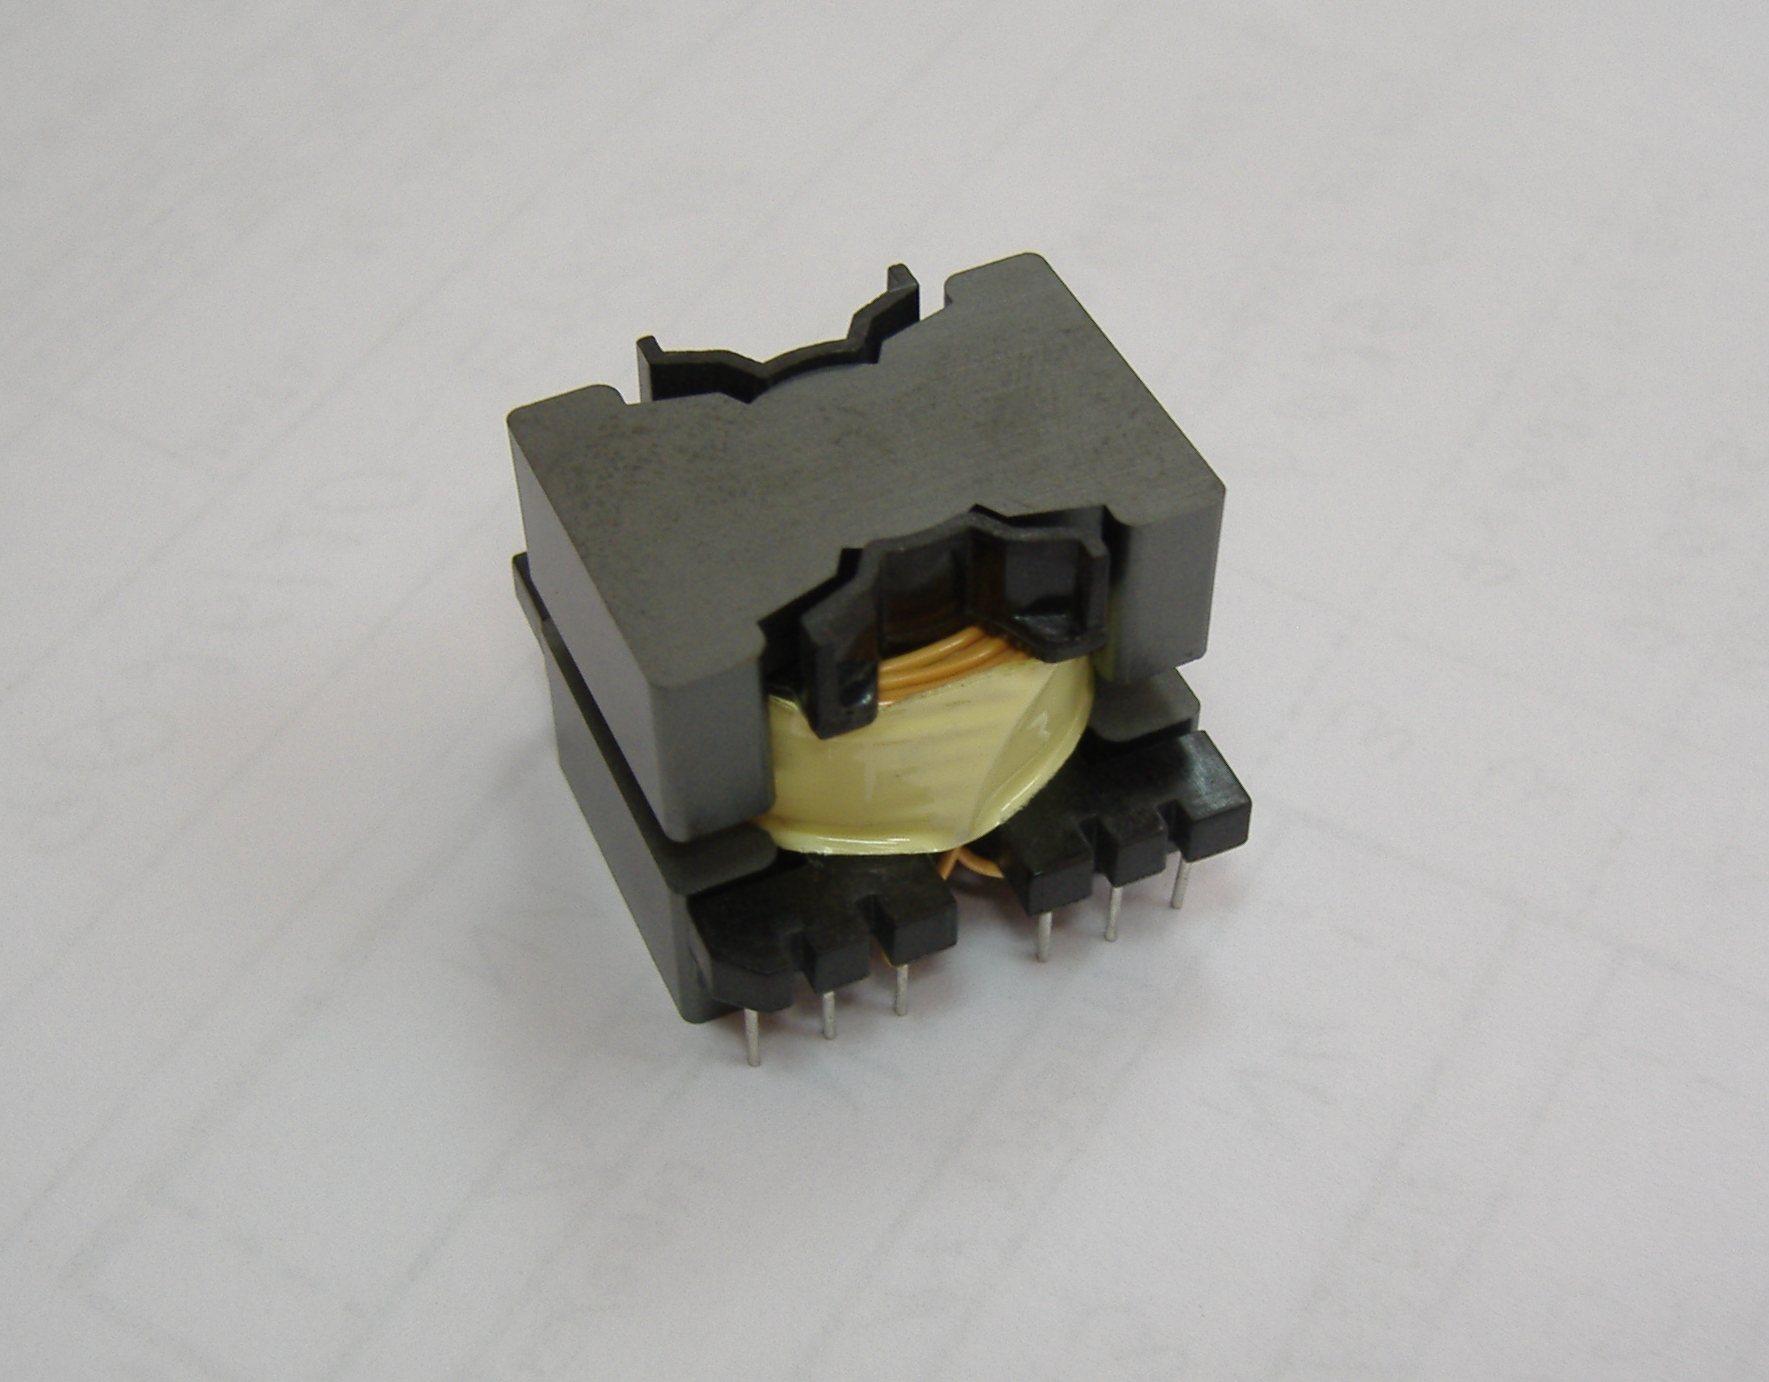 epr 11 transformer epr 11 kit epr 11 pcb. Black Bedroom Furniture Sets. Home Design Ideas